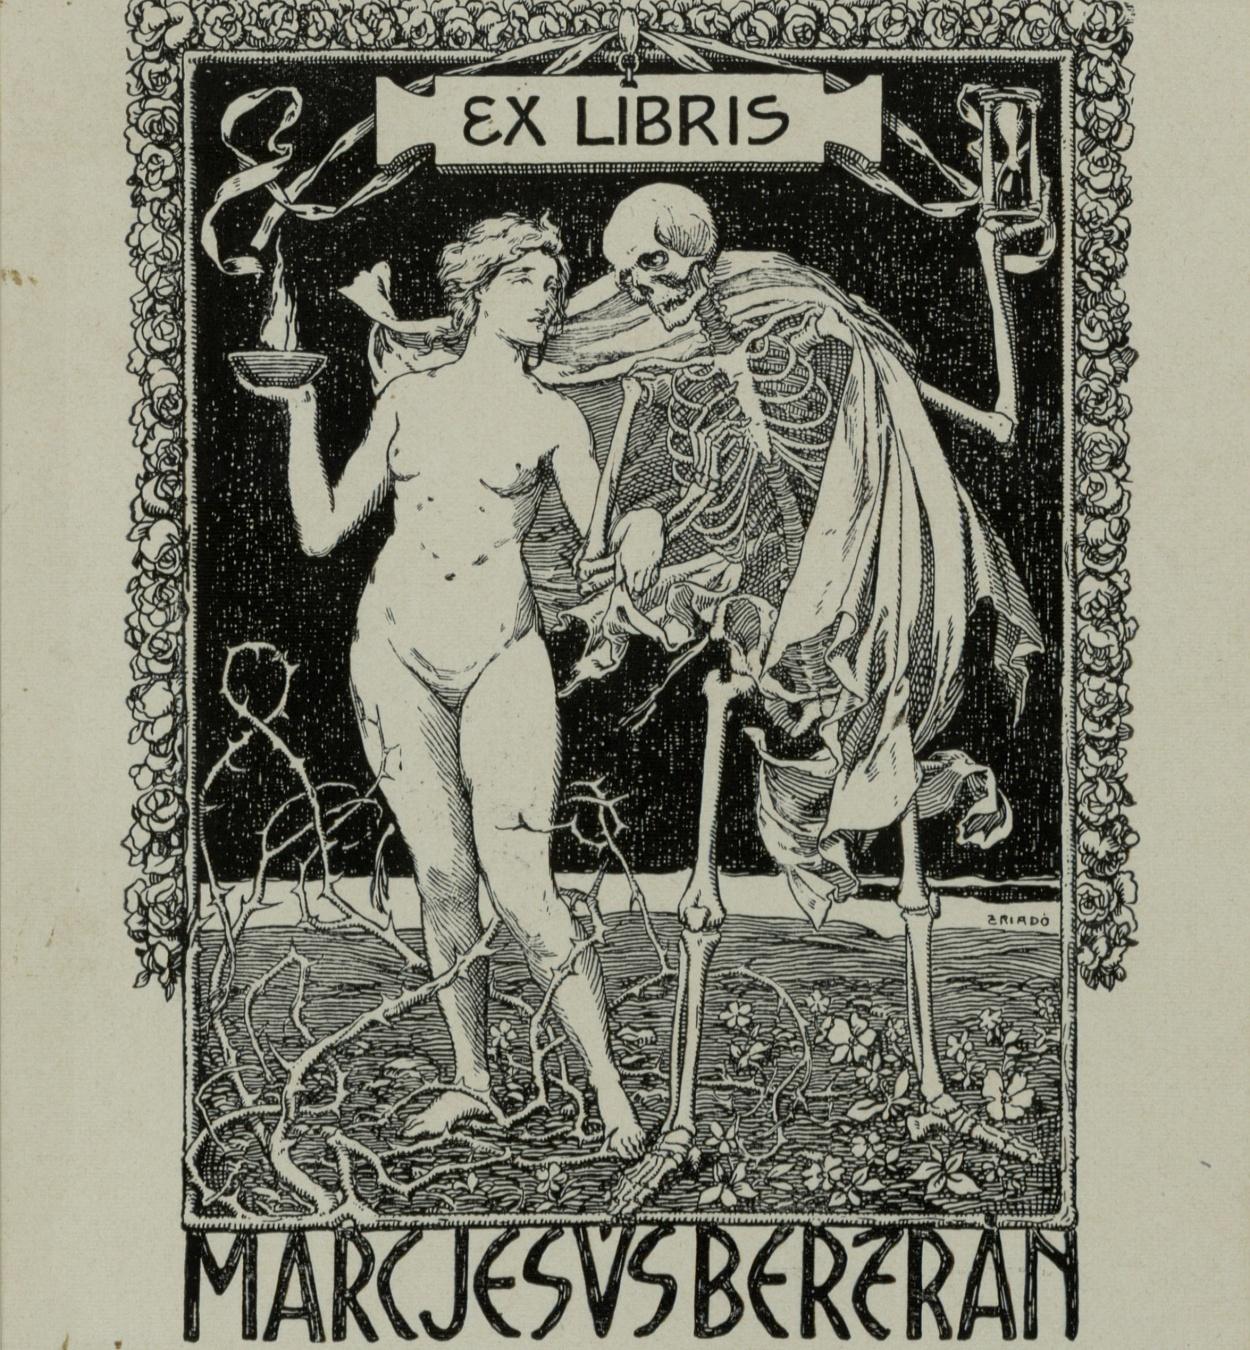 Josep Triadó - Book-plate Marc Jesús Bertrán - 1901